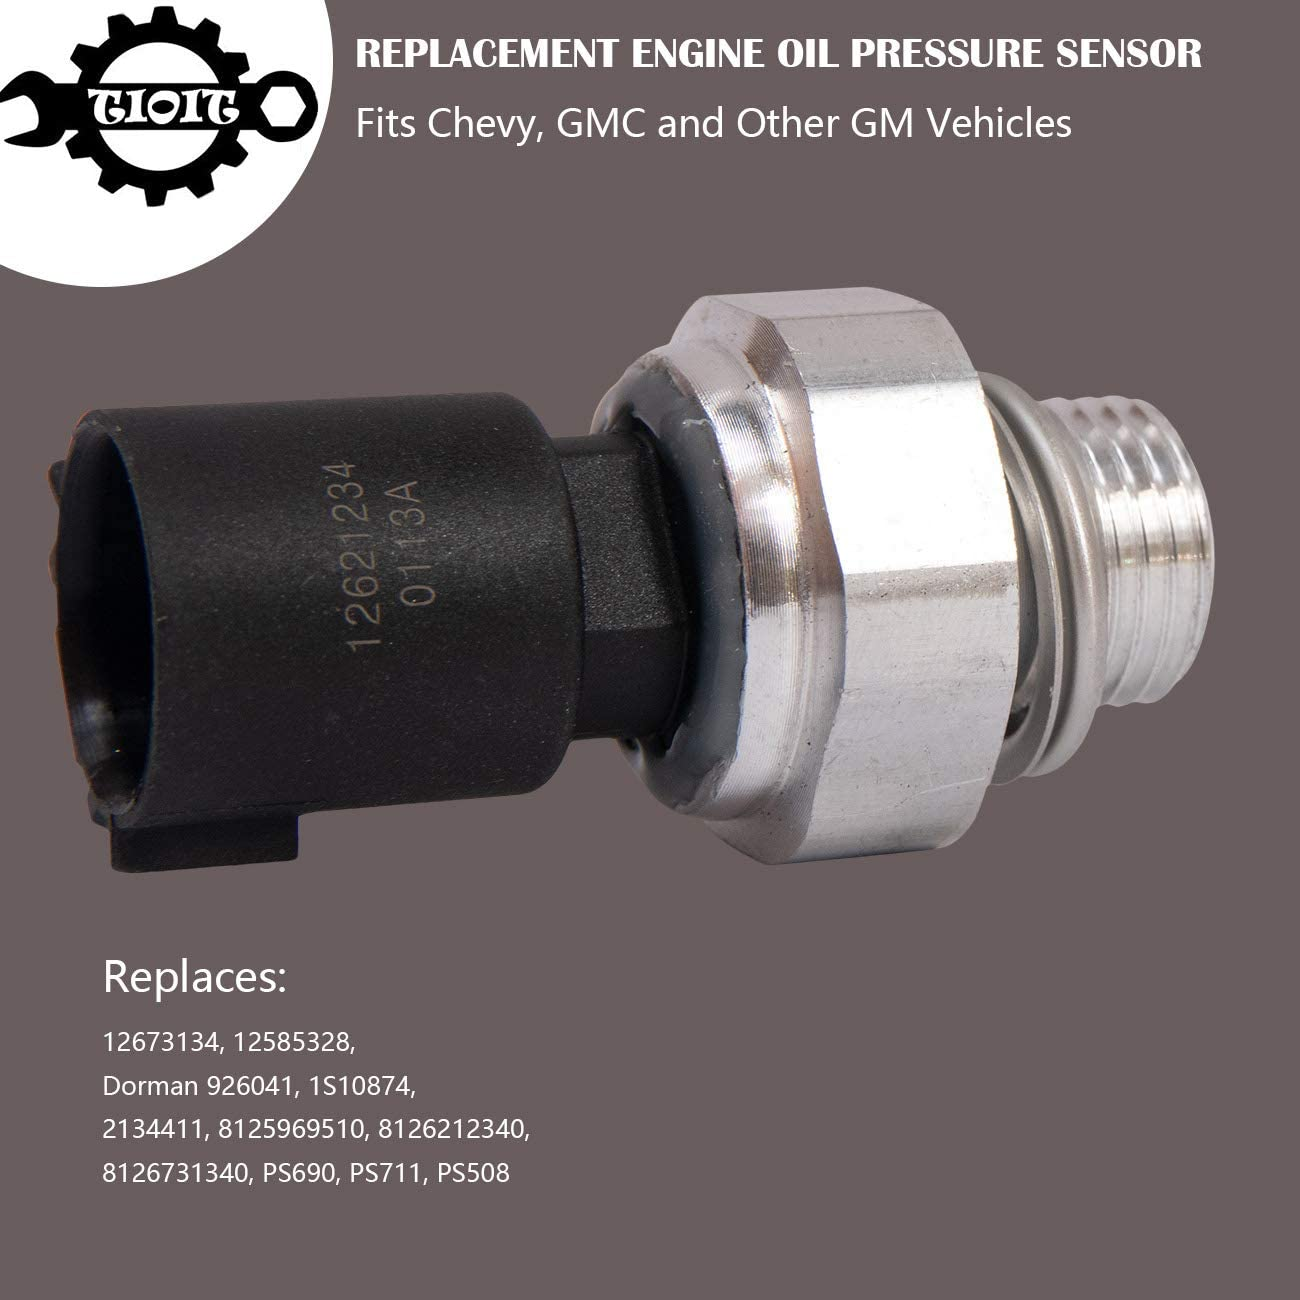 Pontiac GMC Buick Rainier 12621234 Chevrolet Engine Oil Pressure Sensor Switch,Oil Pressure Sensor Replaces 12673134 Silverado Cadillac 213-4411,Fits for Chevy